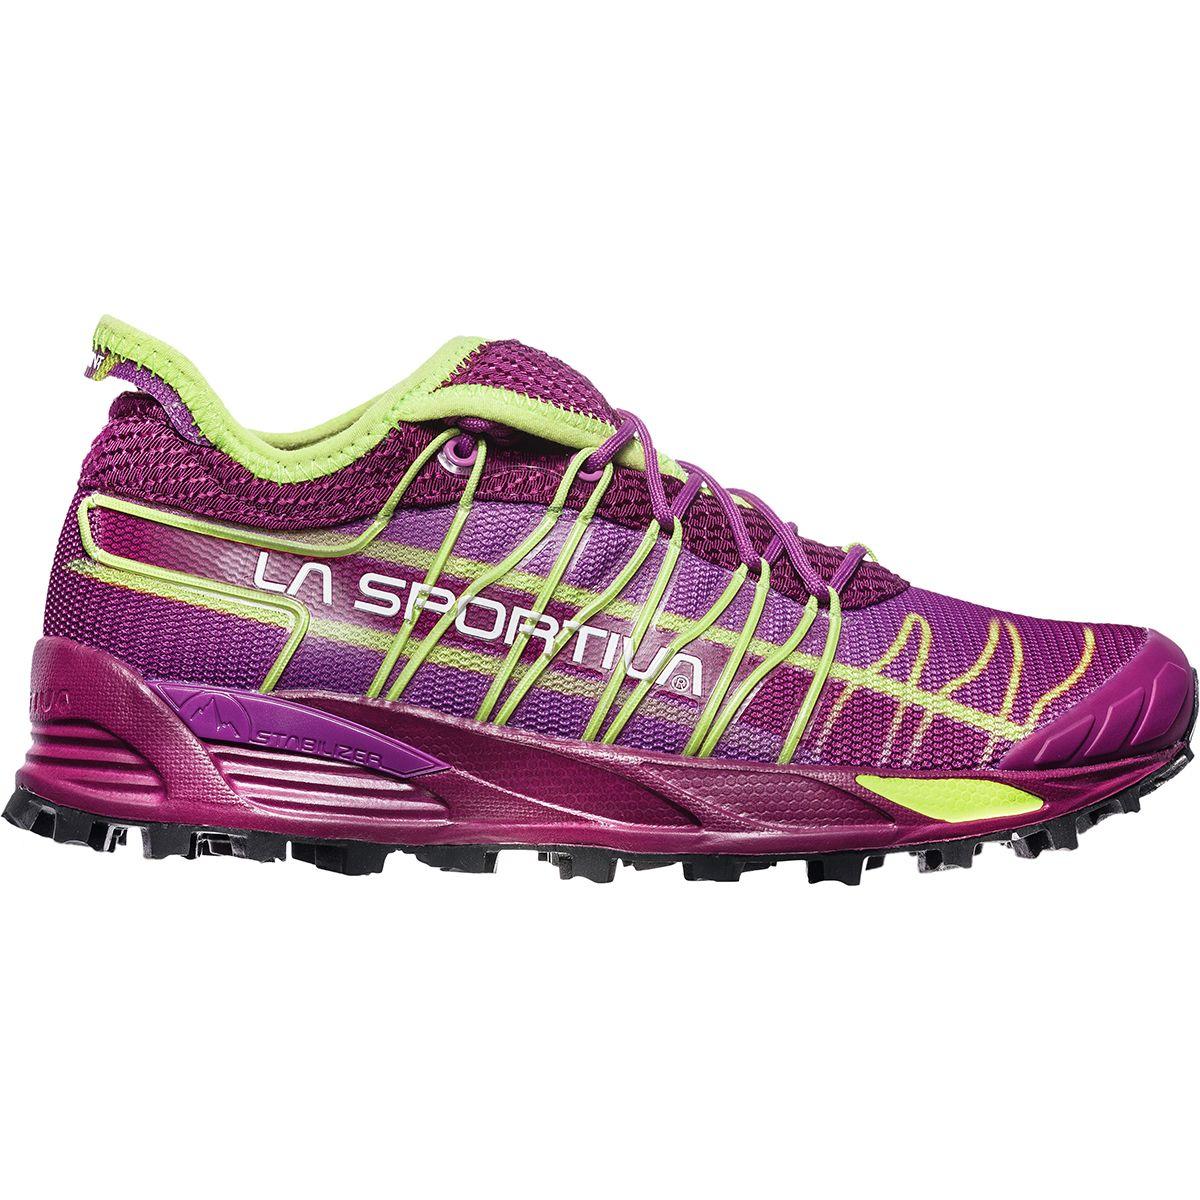 photo: La Sportiva Women's Mutant trail running shoe